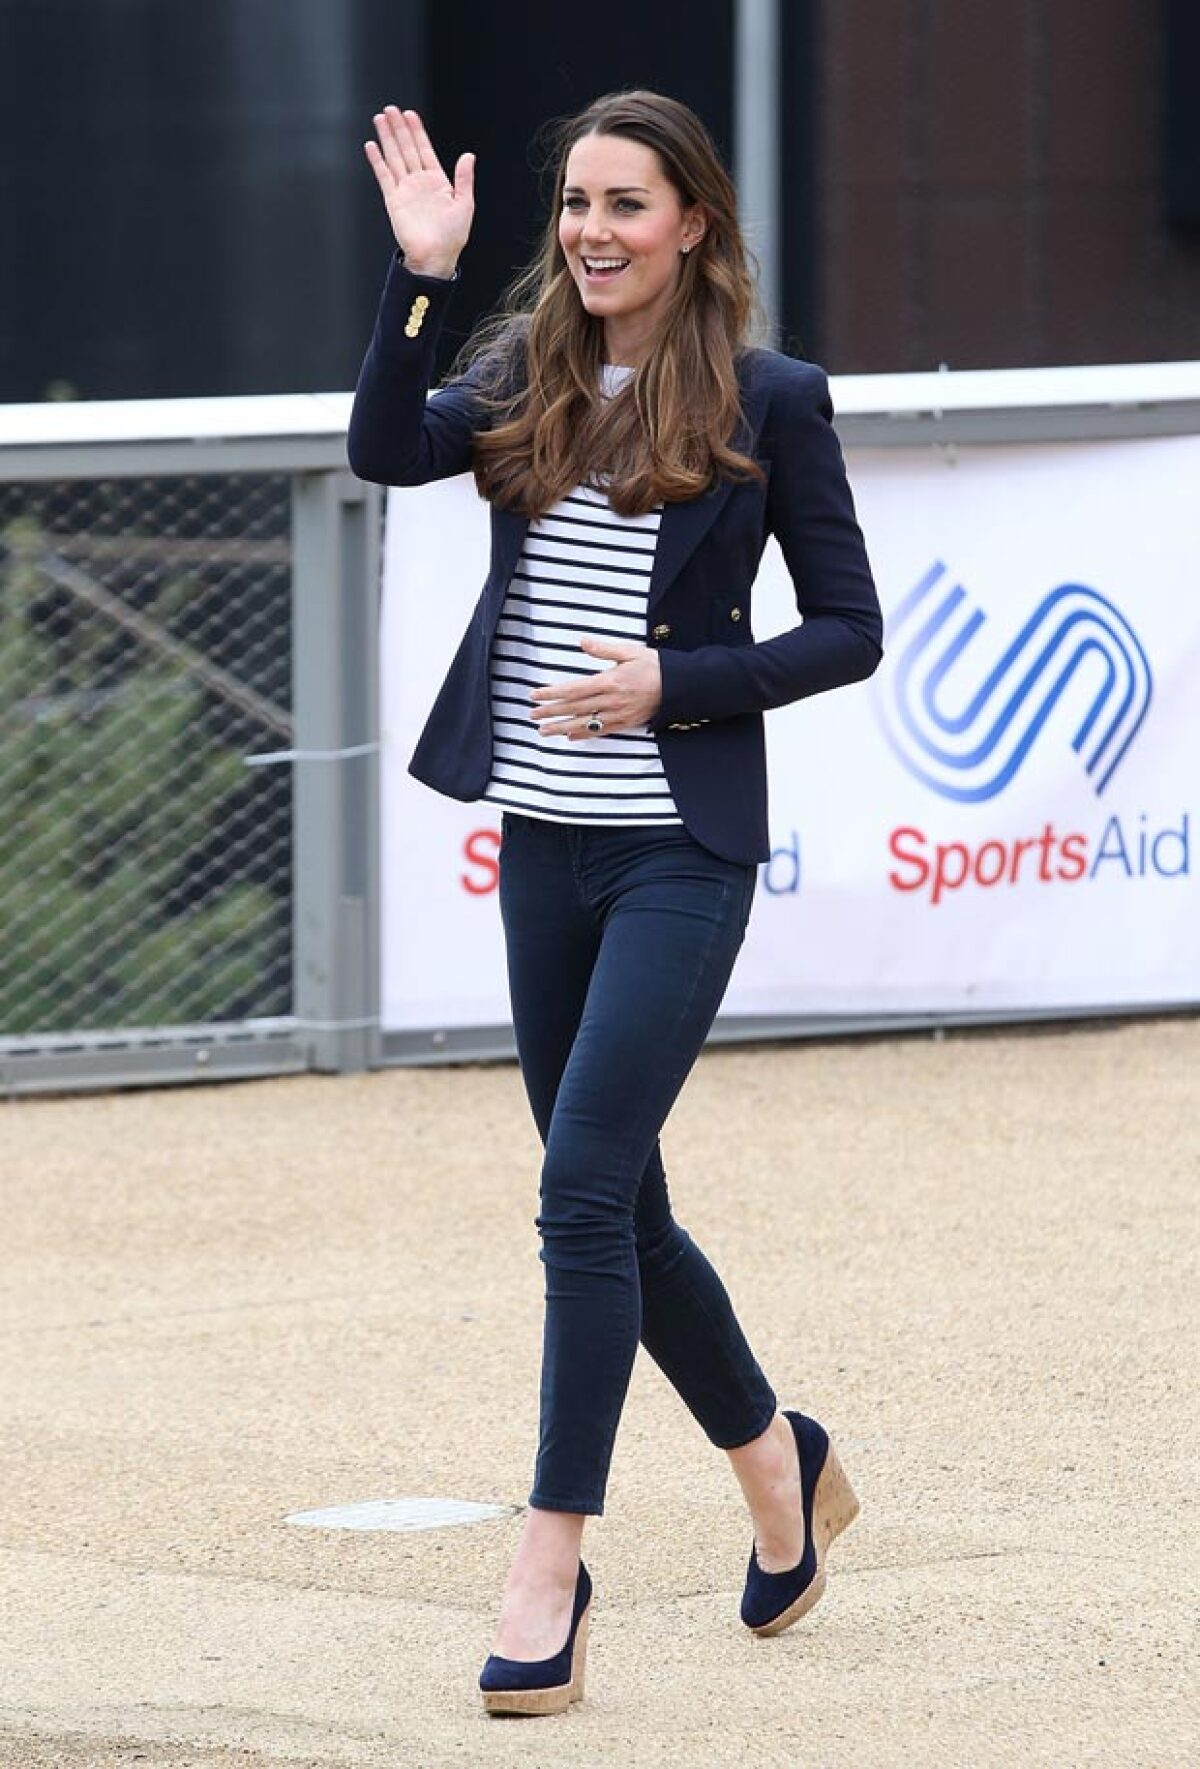 La reina Isabel II no aprueba los zapatos que usa Kate Middleton